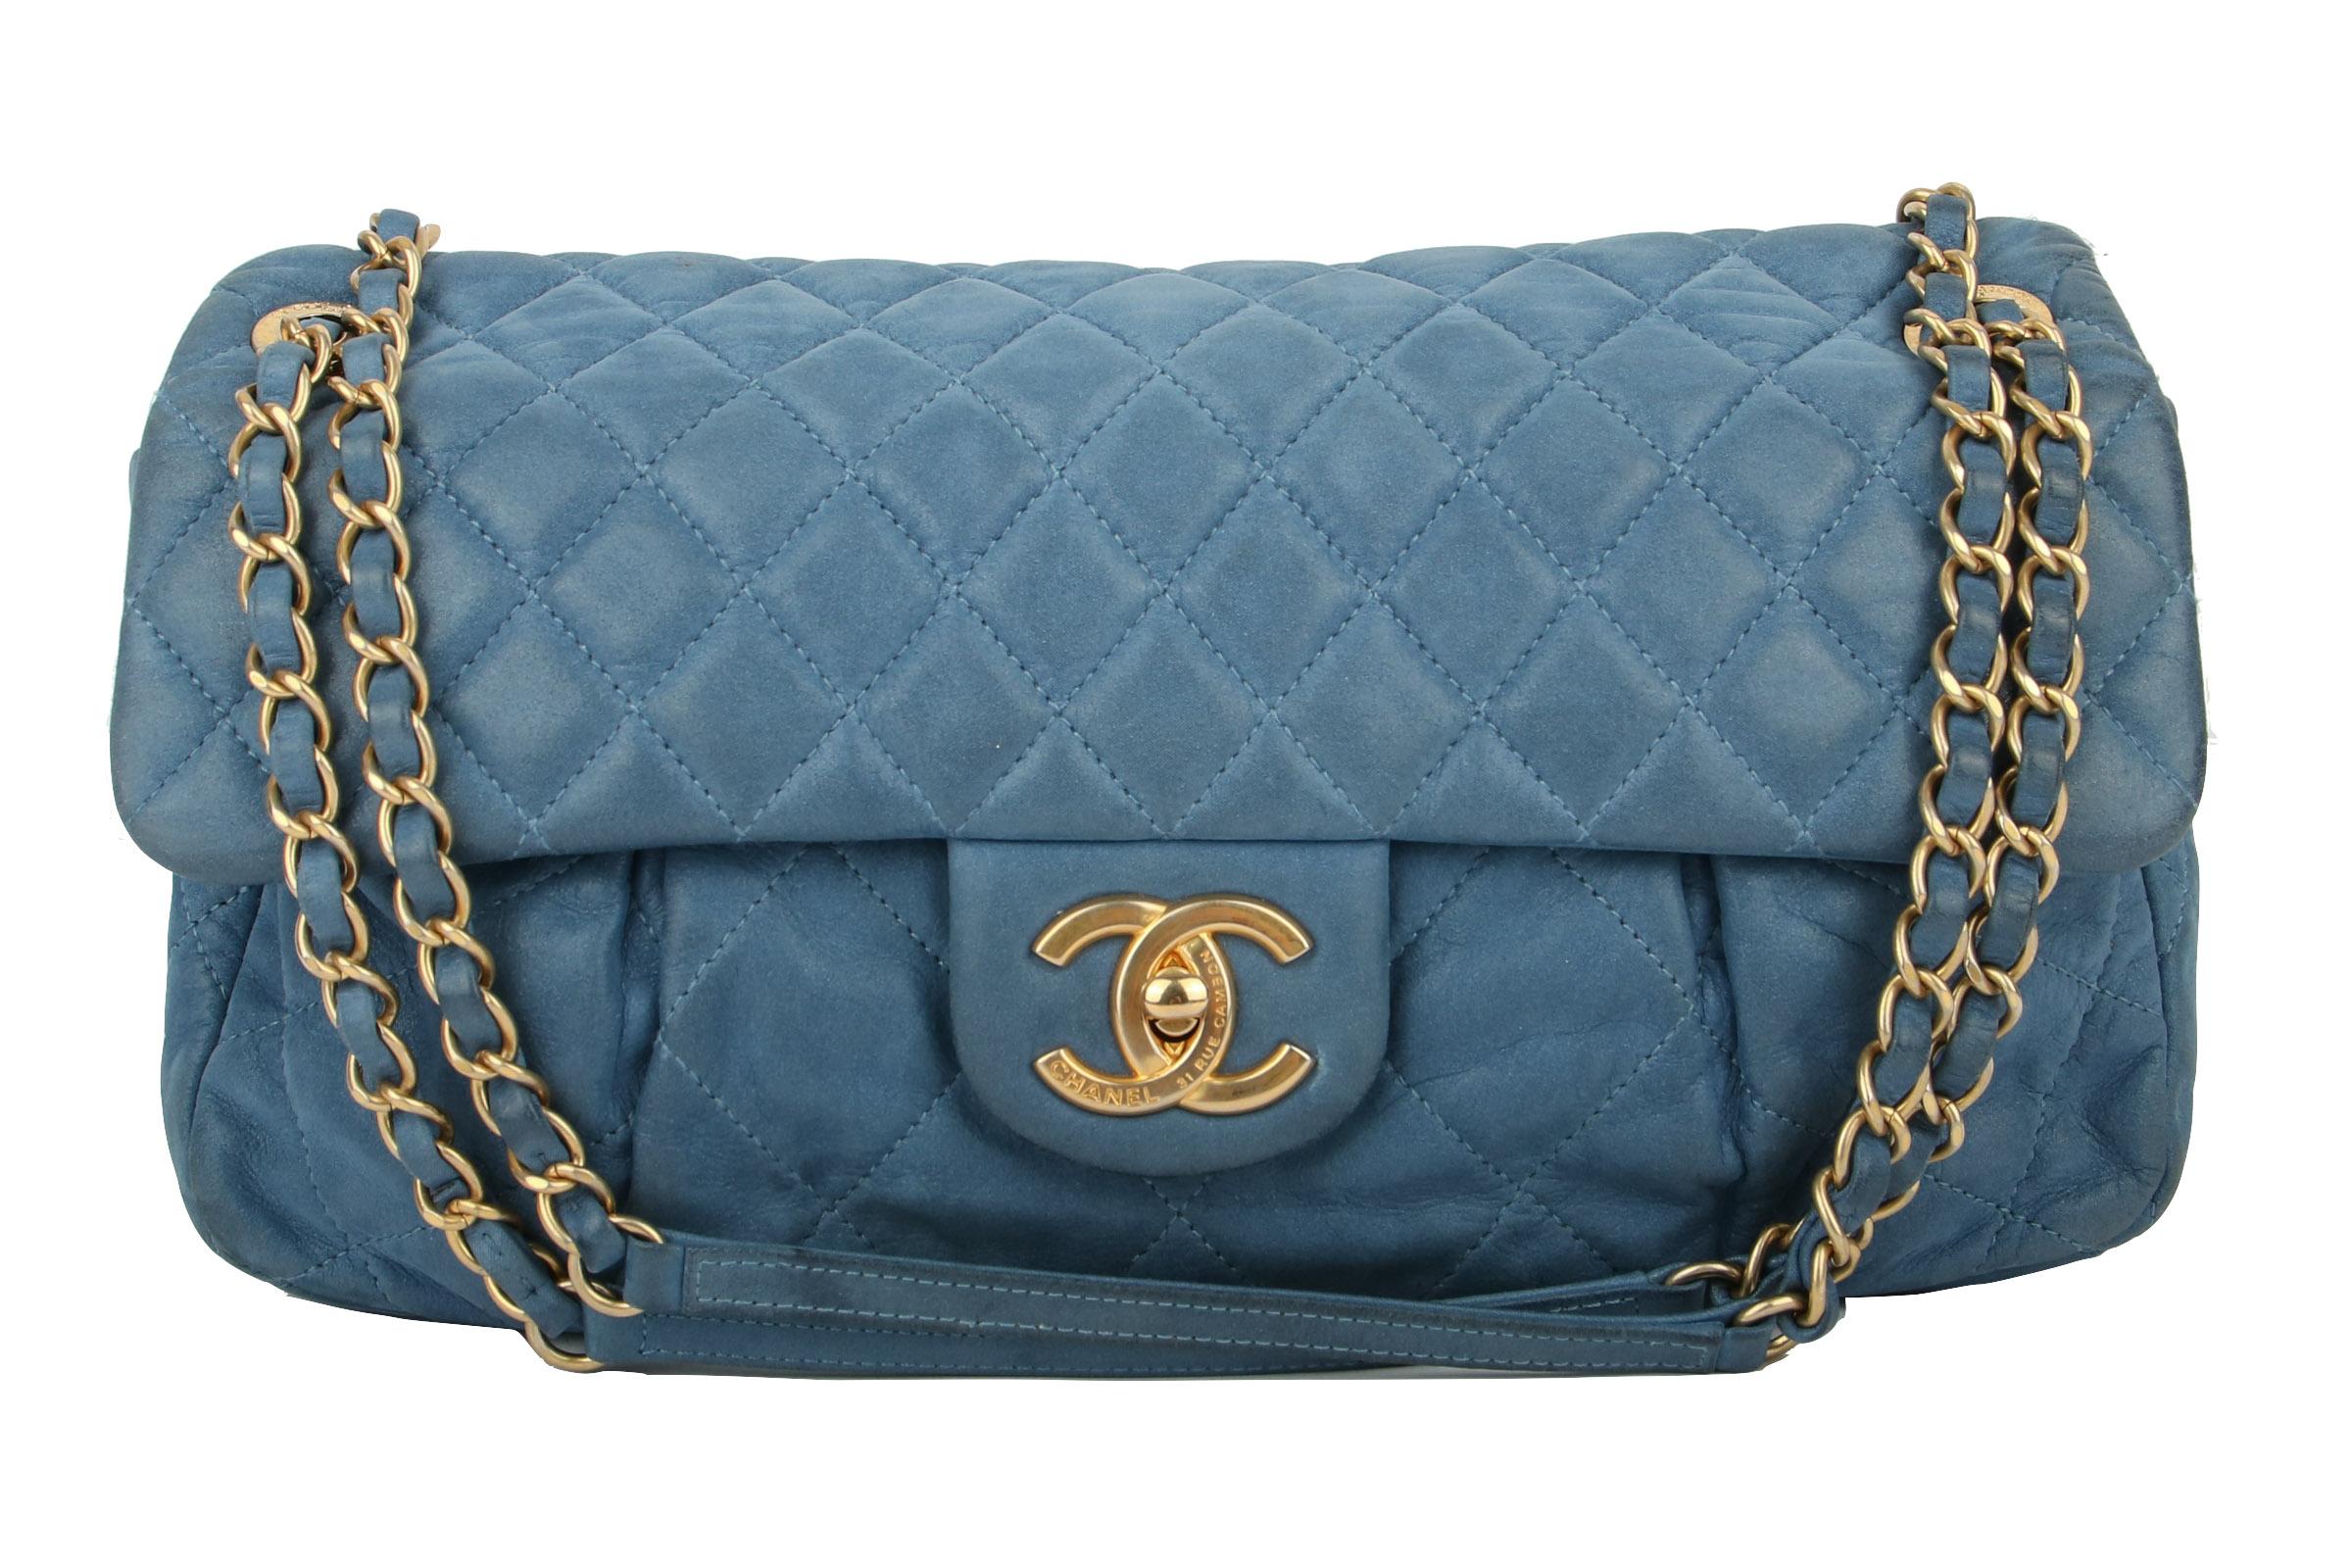 53350f487c5cd Chanel Handtaschen   Accessoires